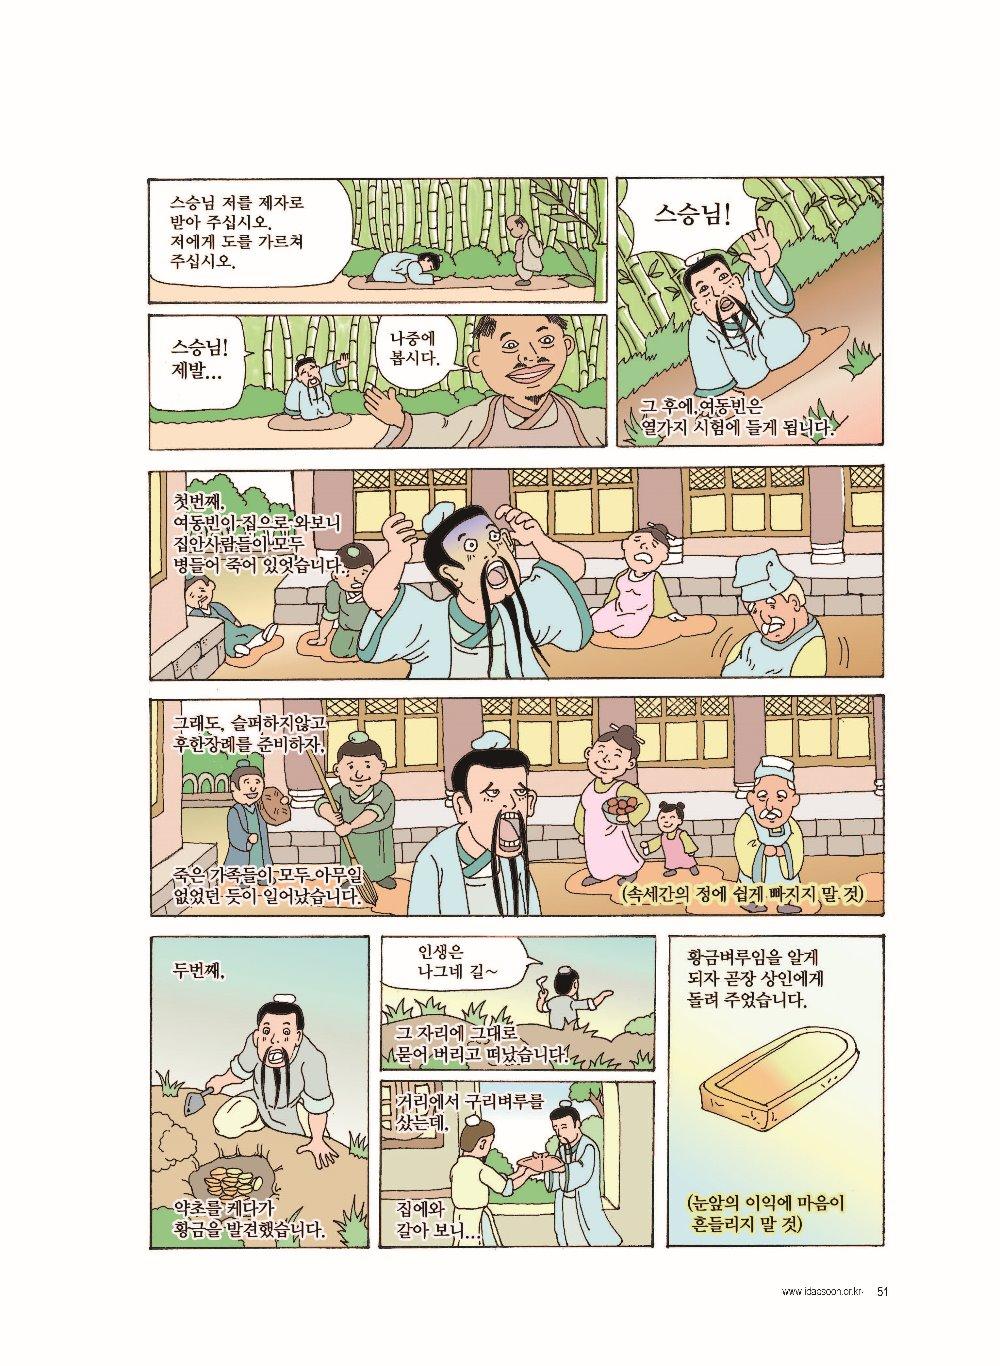 Daesoon_158_만화_페이지_4.jpg